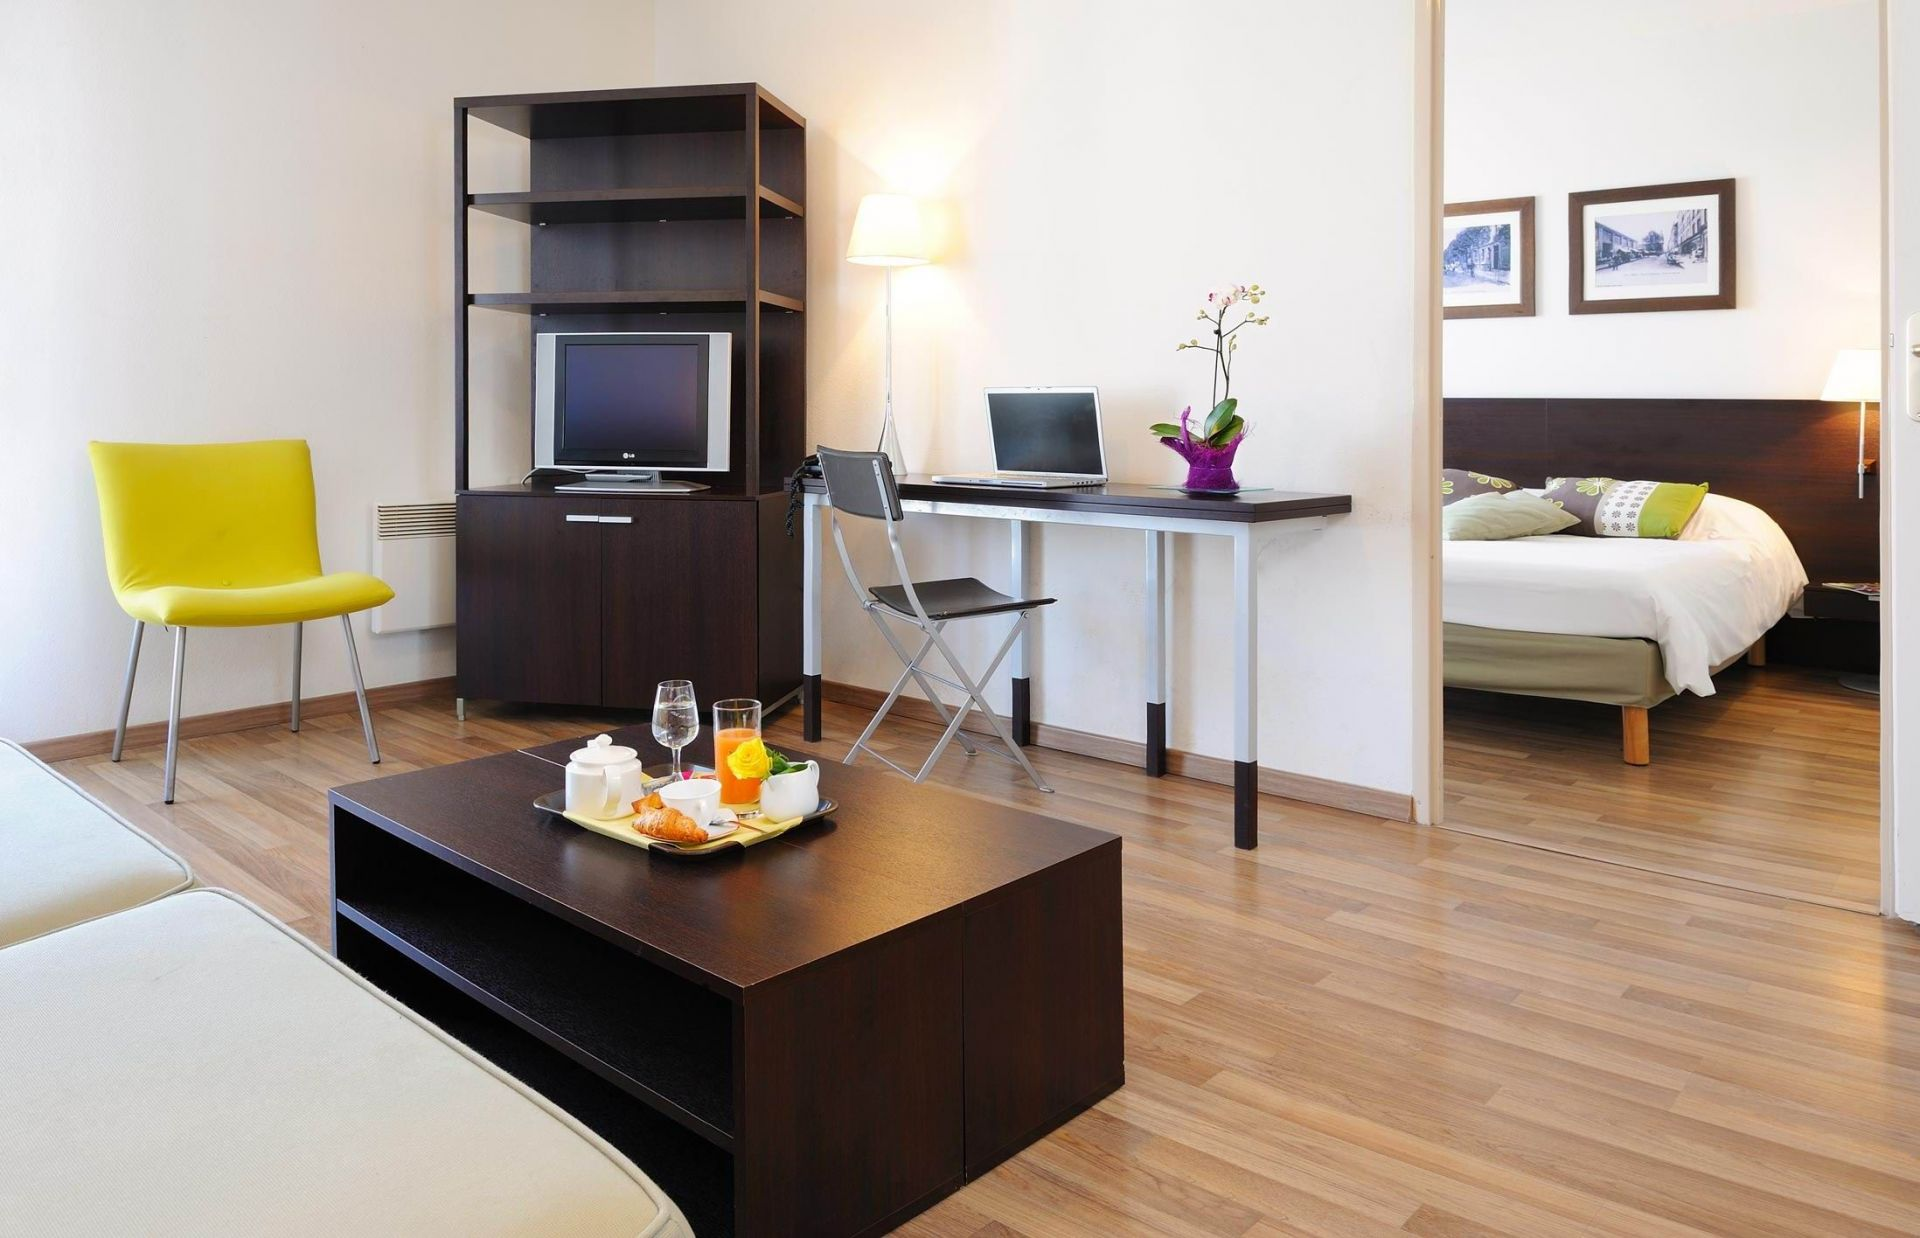 residhome nancy lorraine lorraine tourisme. Black Bedroom Furniture Sets. Home Design Ideas